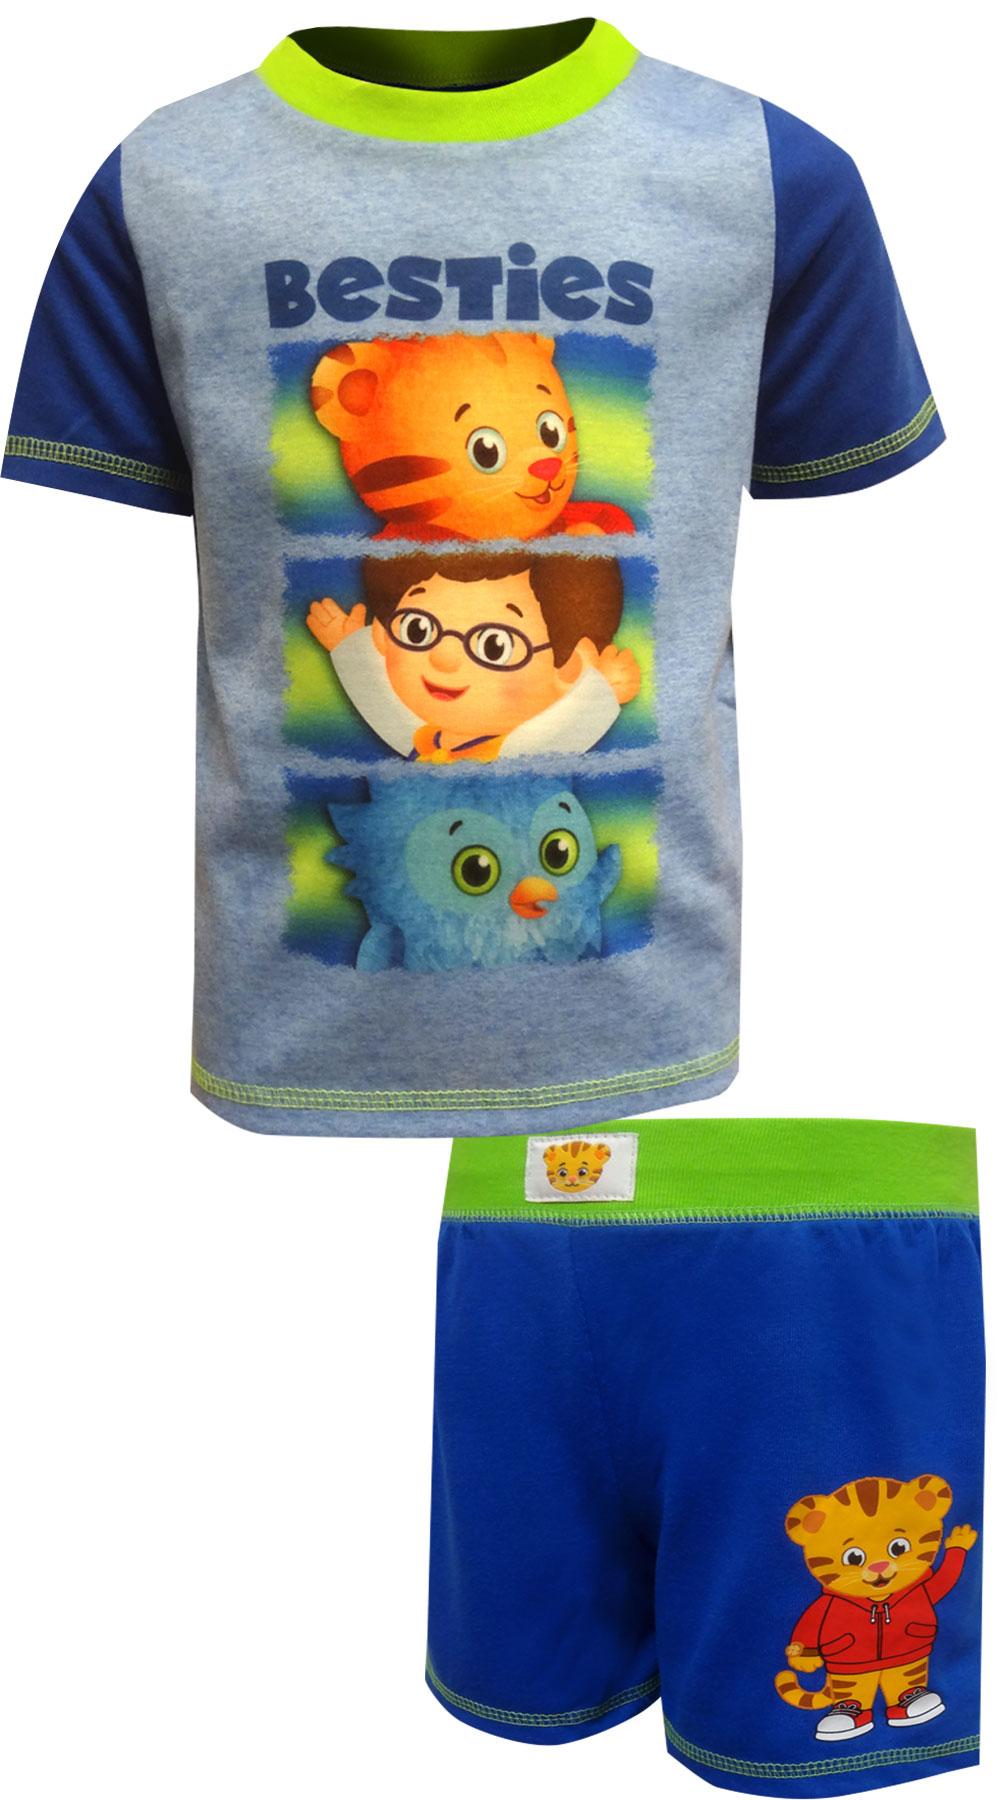 Image of Daniel Tiger's Neighborhood Besties Toddler Pajamas for boys